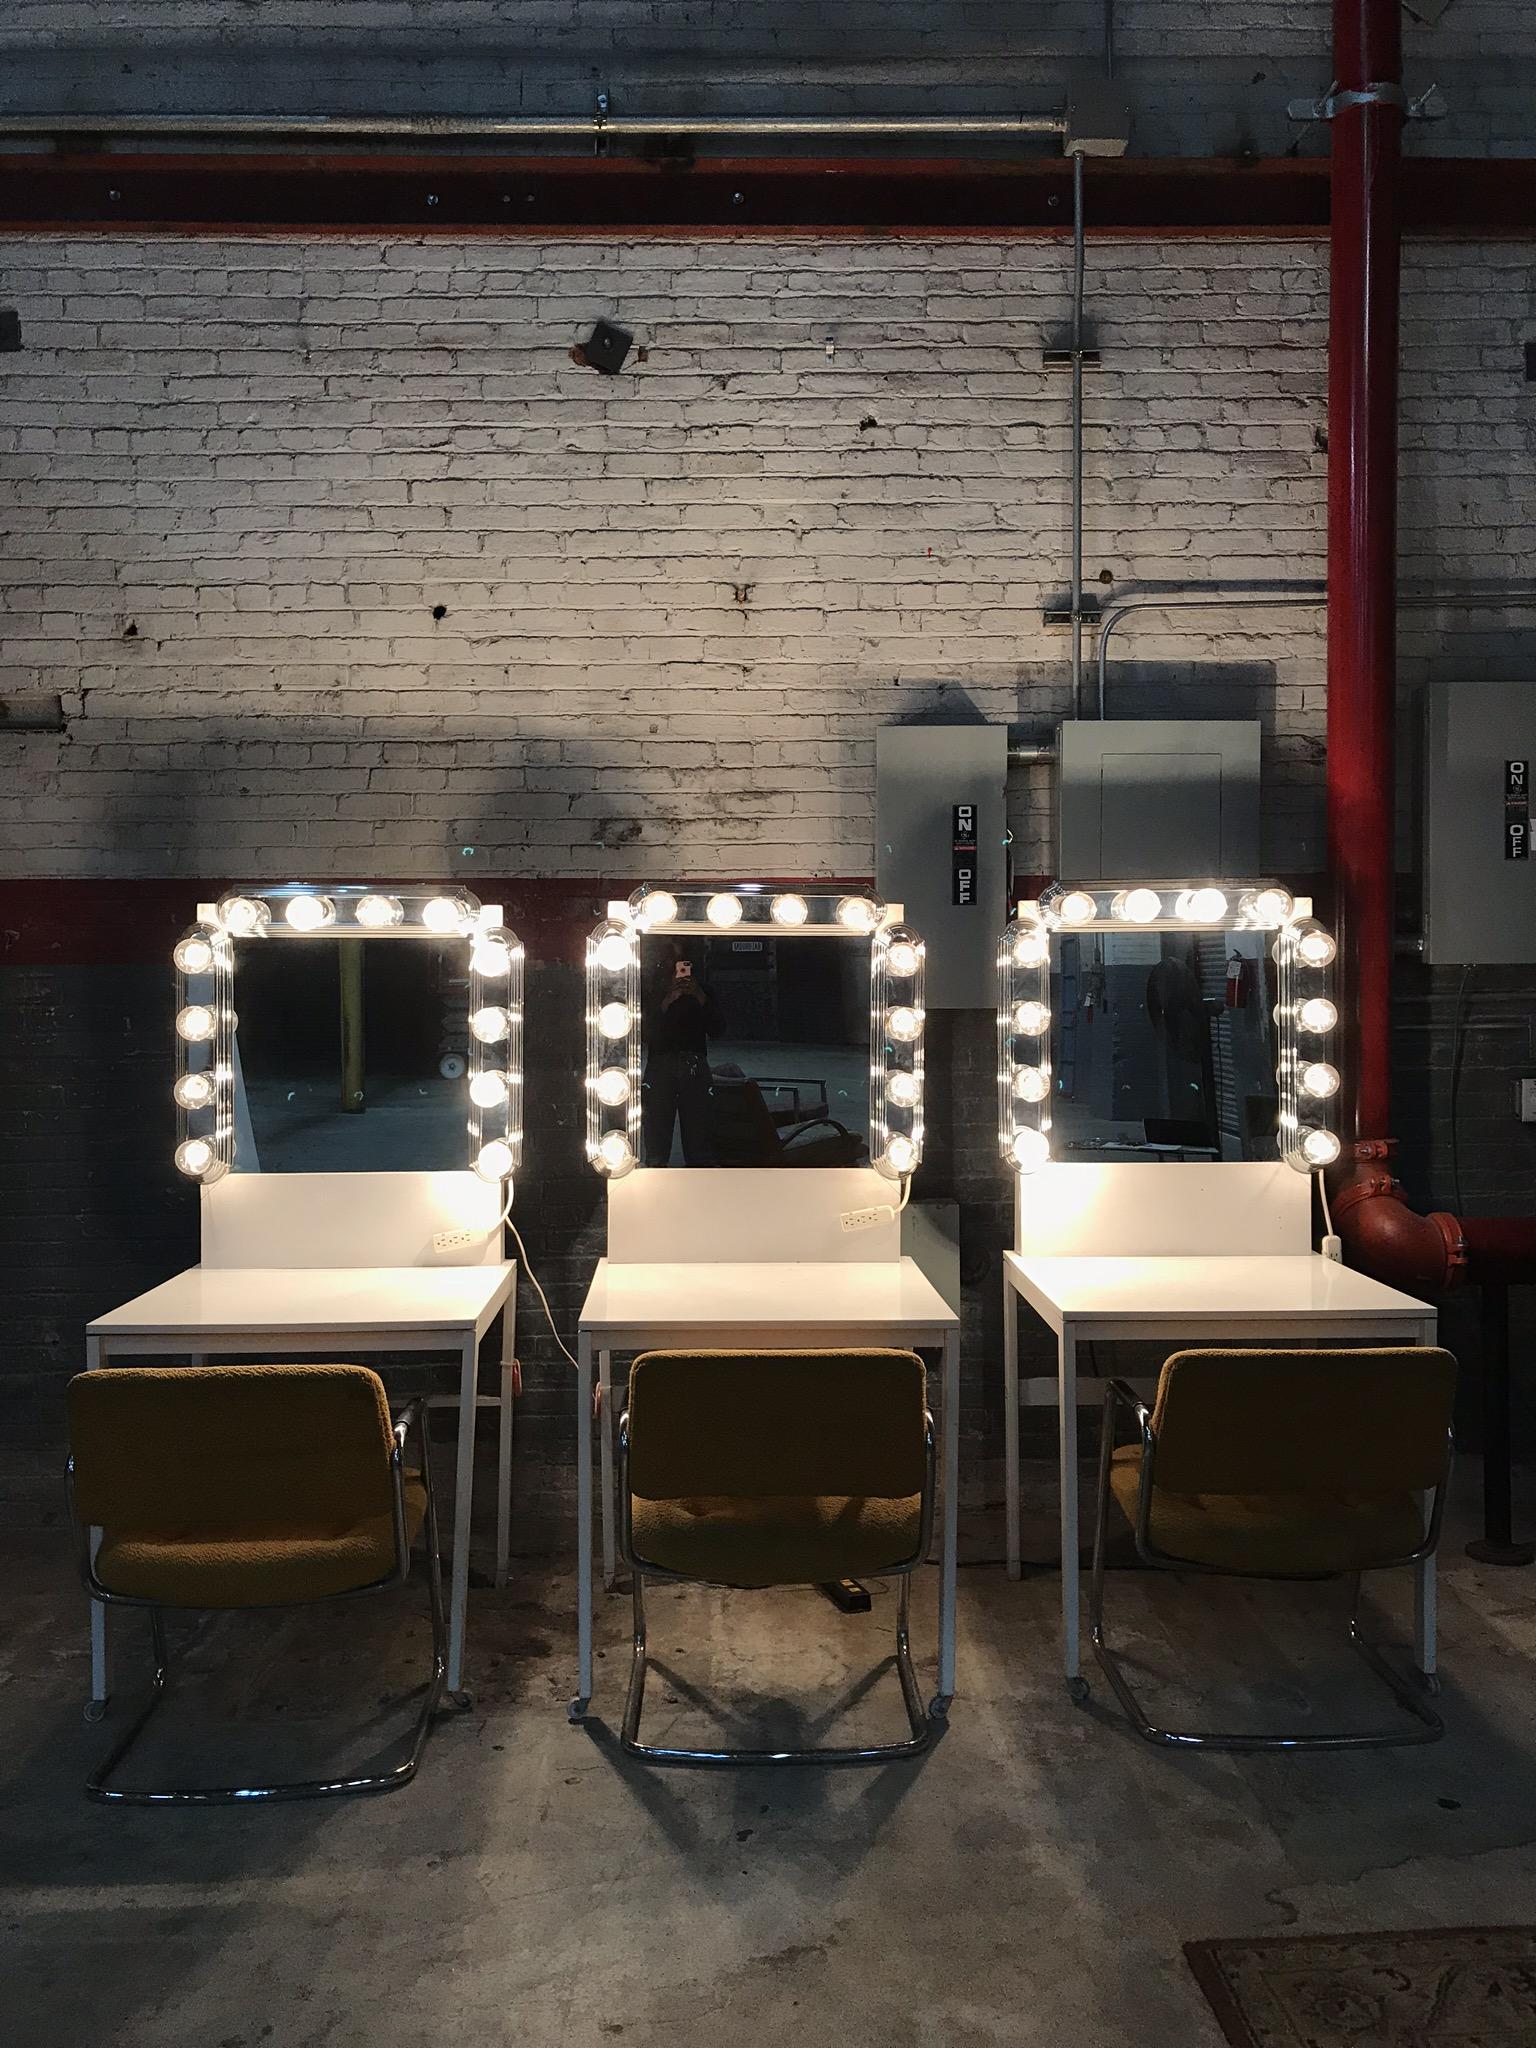 Single White Vanity Tables (3 total) $200/ea